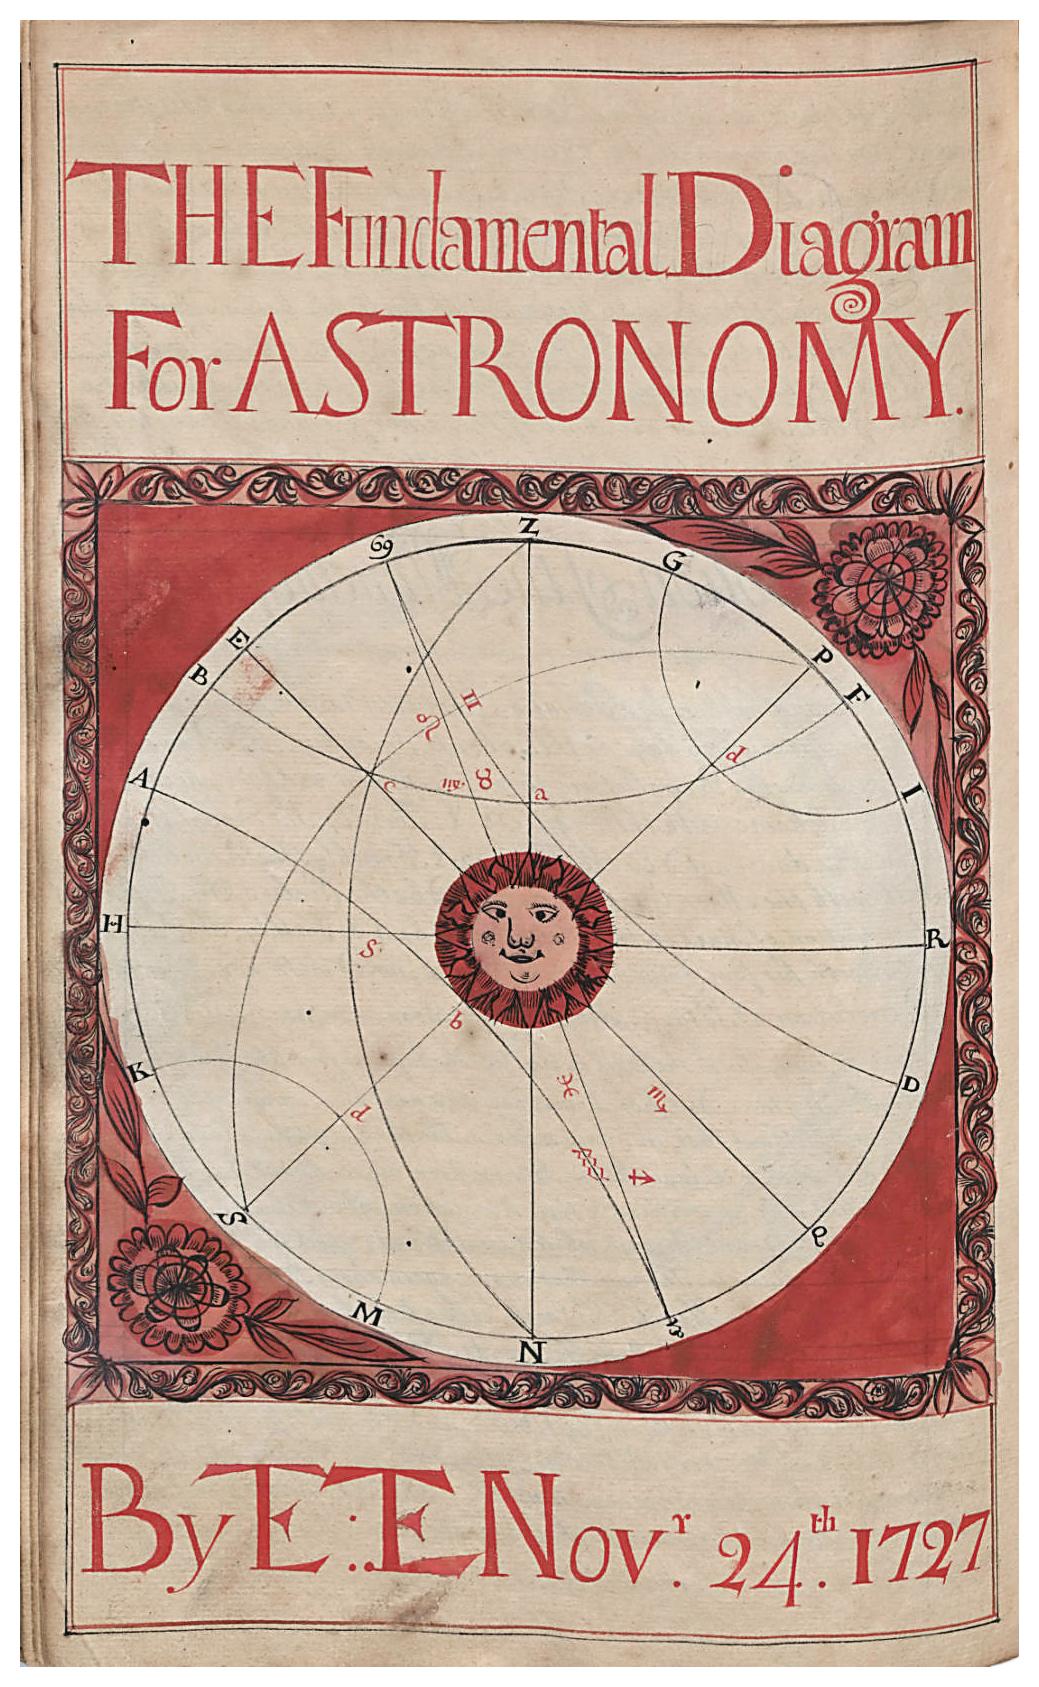 Thomas Earl, The Fundamental Diagram for Astronomy